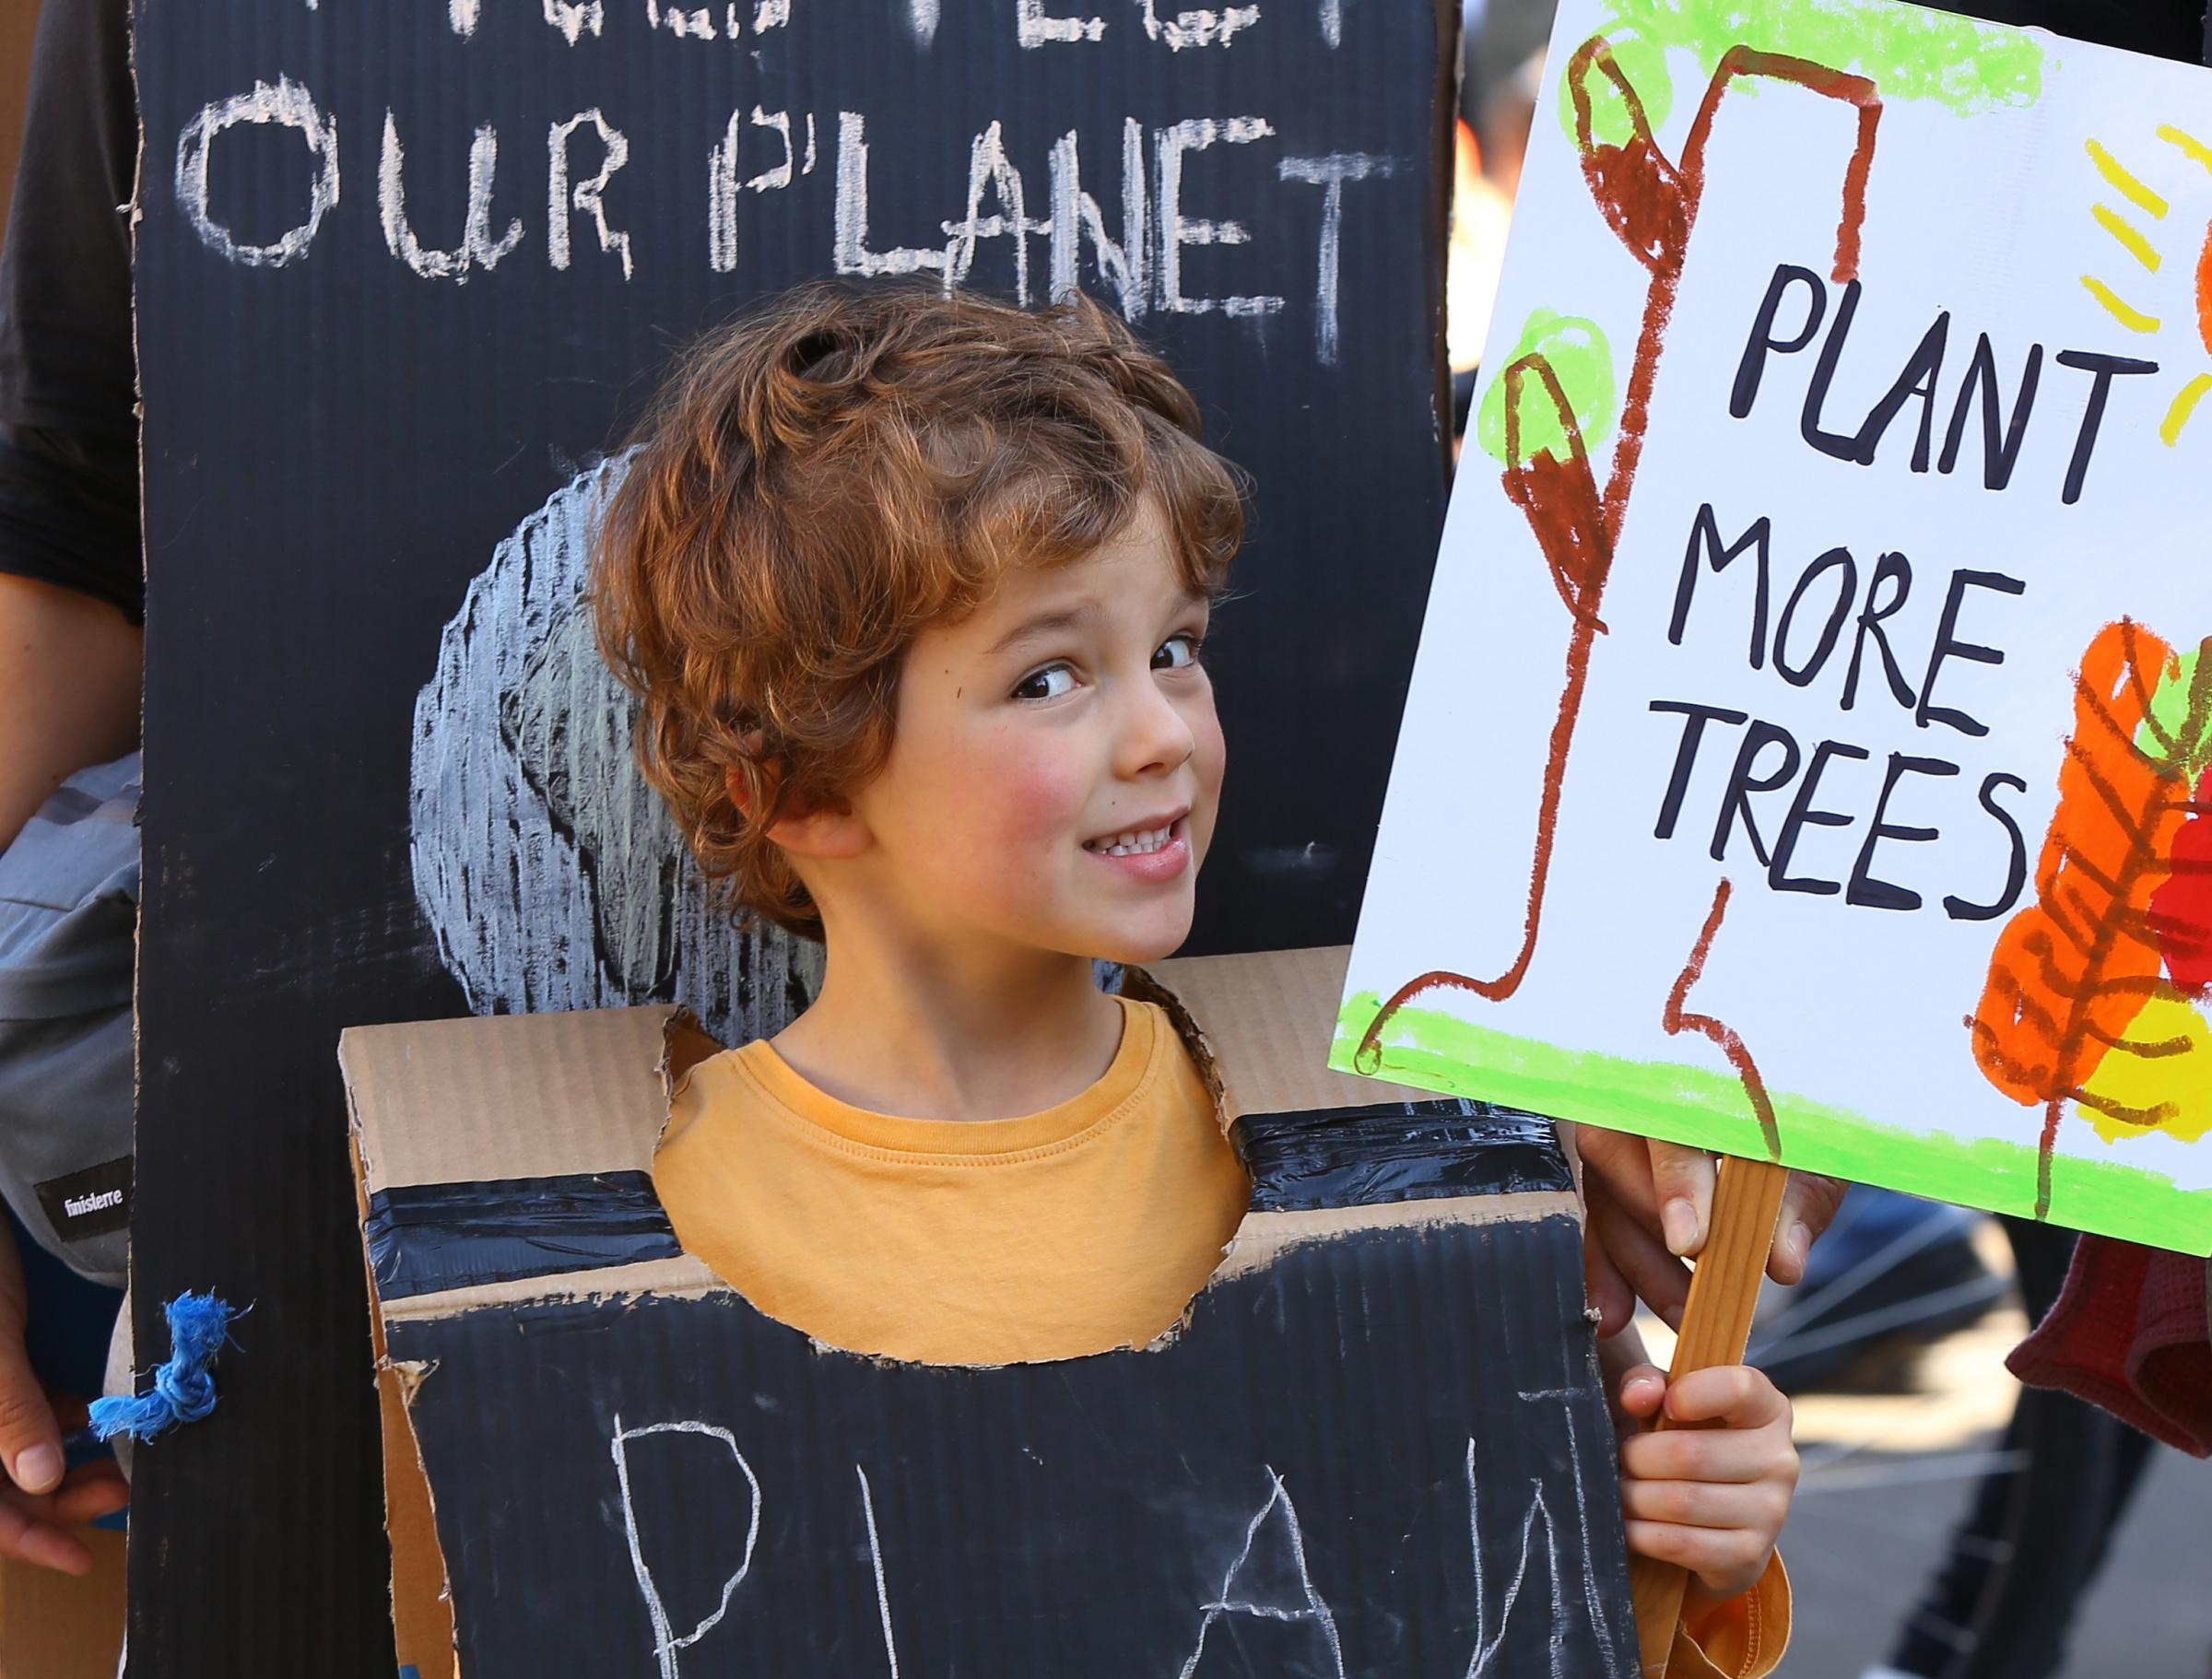 SNP urged to change climate pledges to hit net-zero sooner